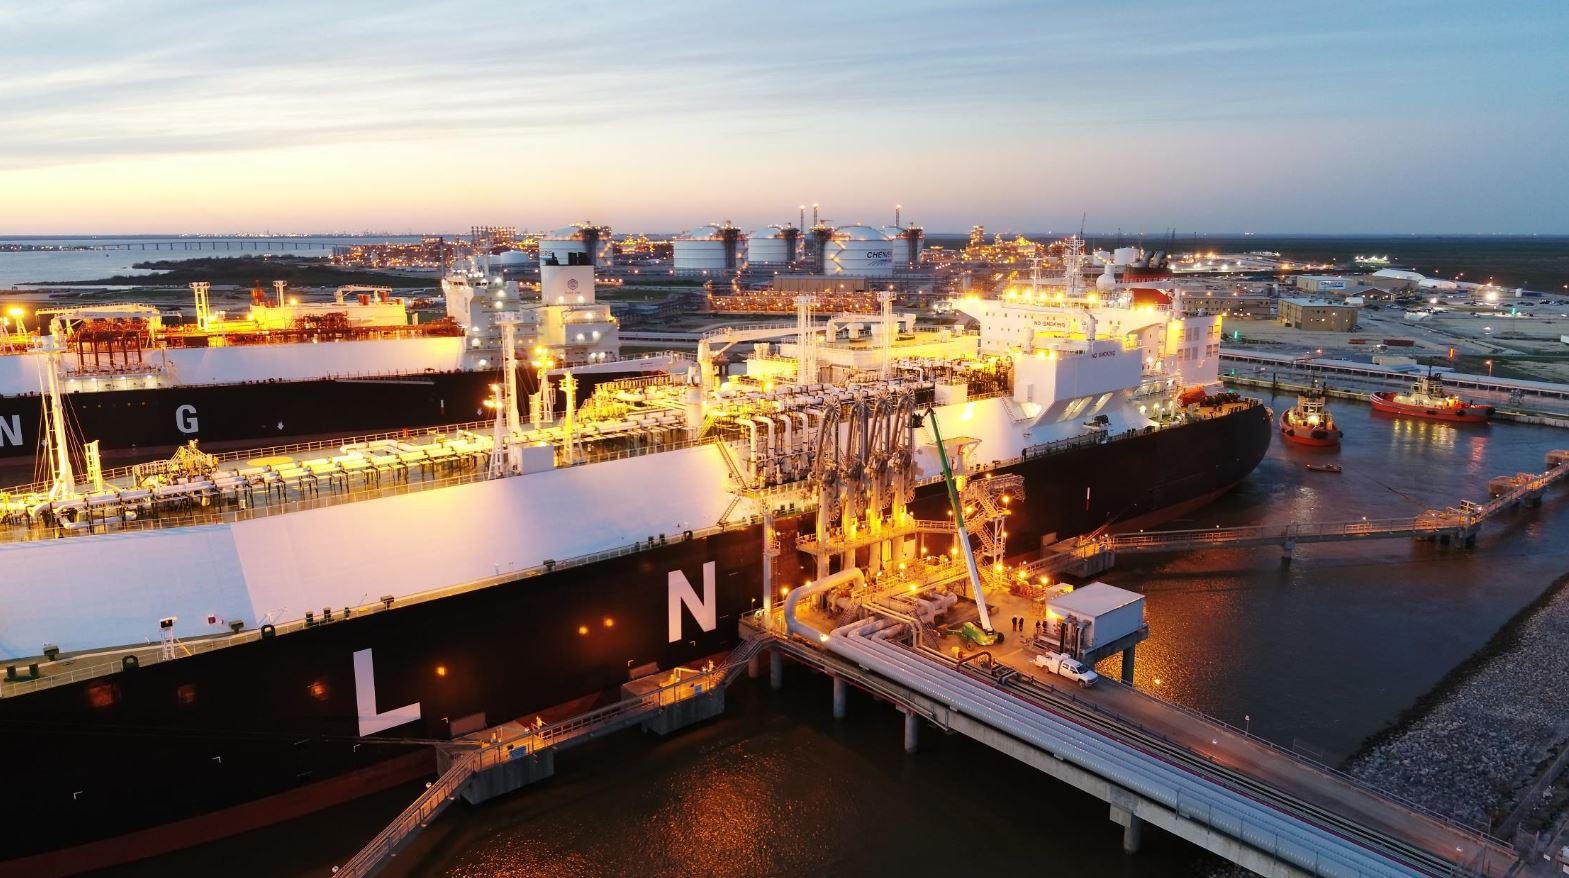 Sabine Pass LNG facility